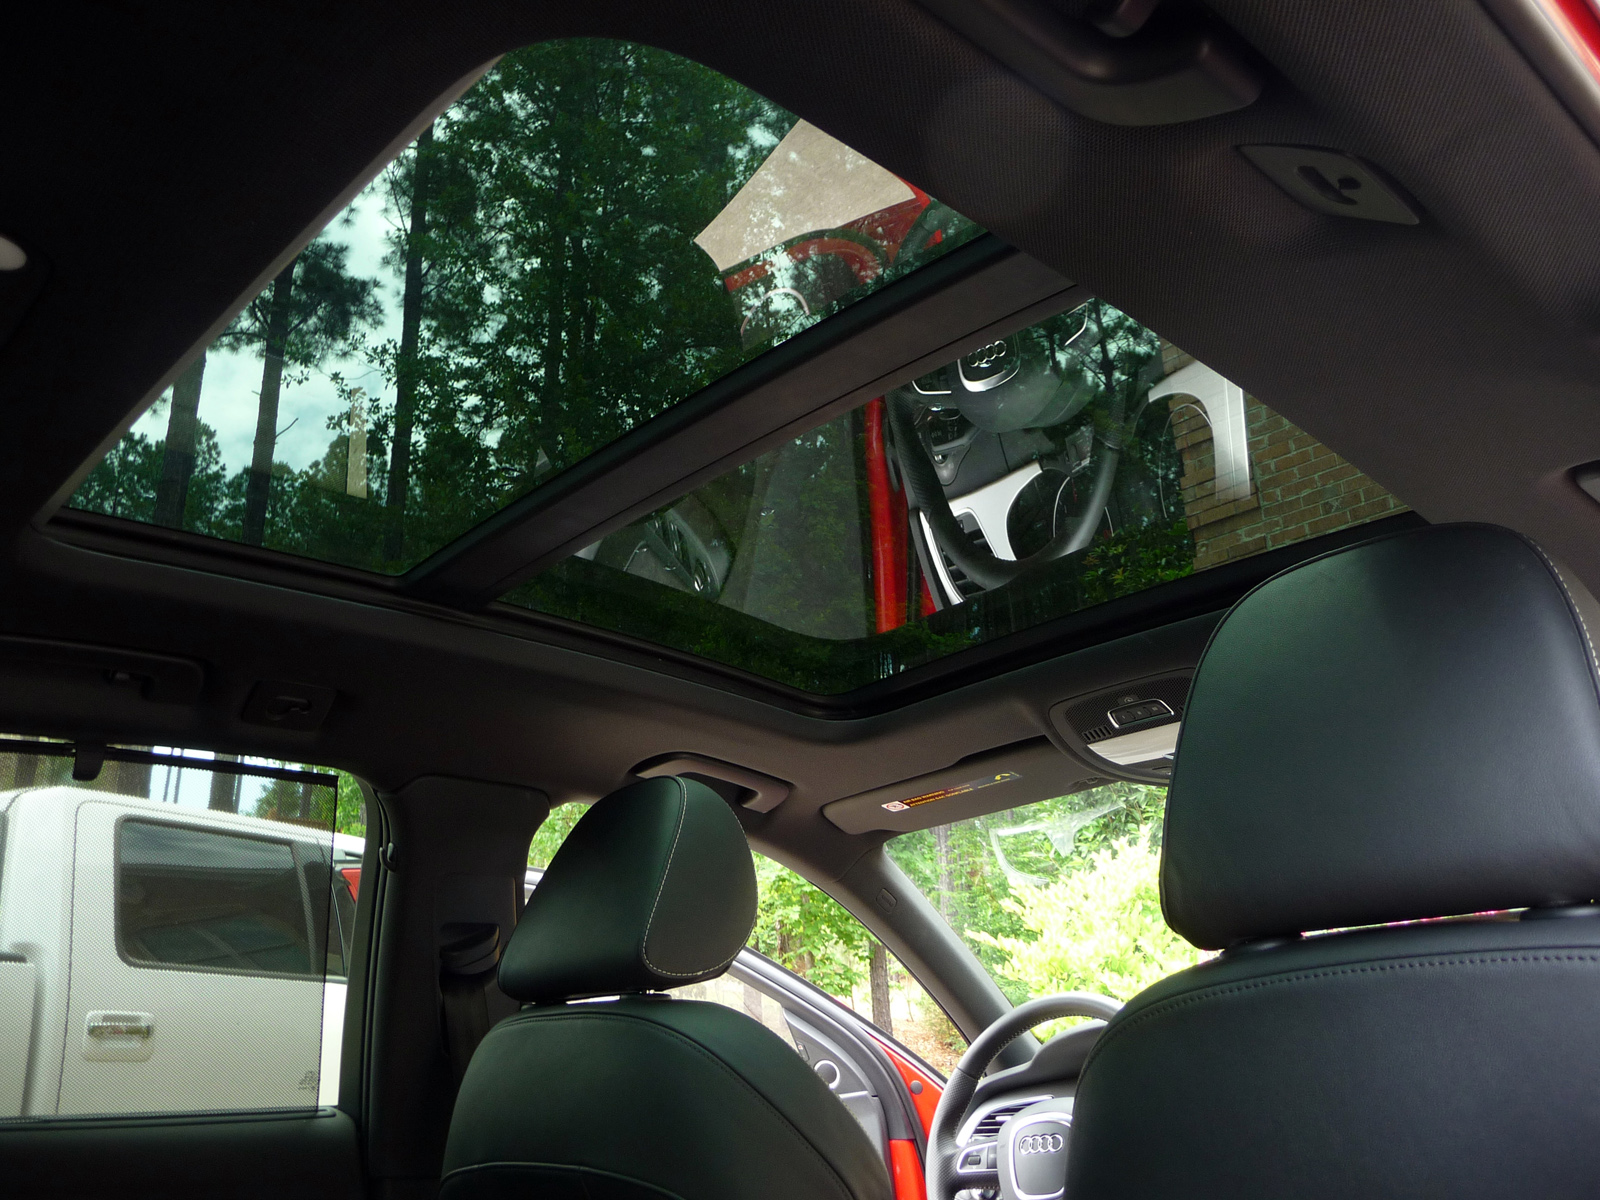 FOR SALE: 2009 Audi A4 2 0T S-Line Prestige Quattro Avant